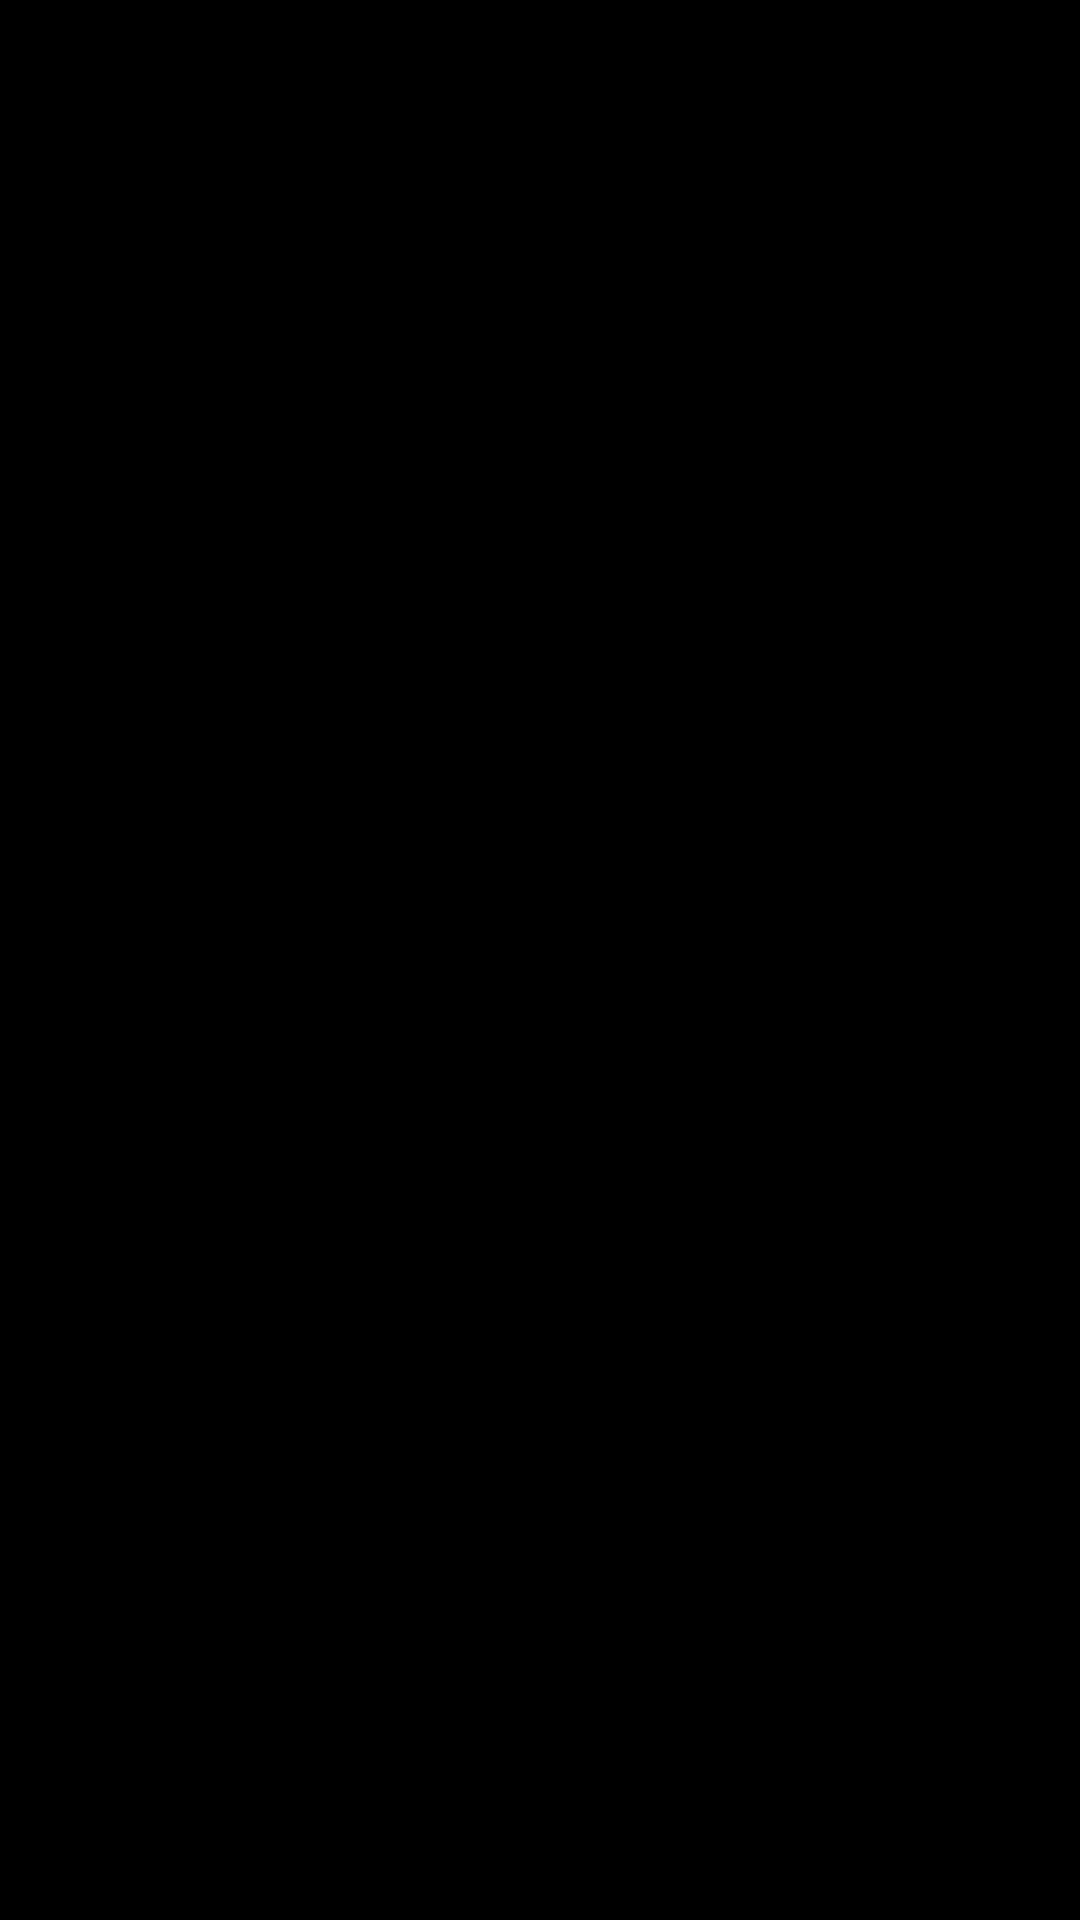 Free Download Wallpaper Anime Black 4k 3840x2160 For Your Desktop Mobile Tablet Explore 7 4k Black Anime Wallpapers 4k Black Anime Wallpapers 4k Anime Wallpaper Anime Wallpaper 4k